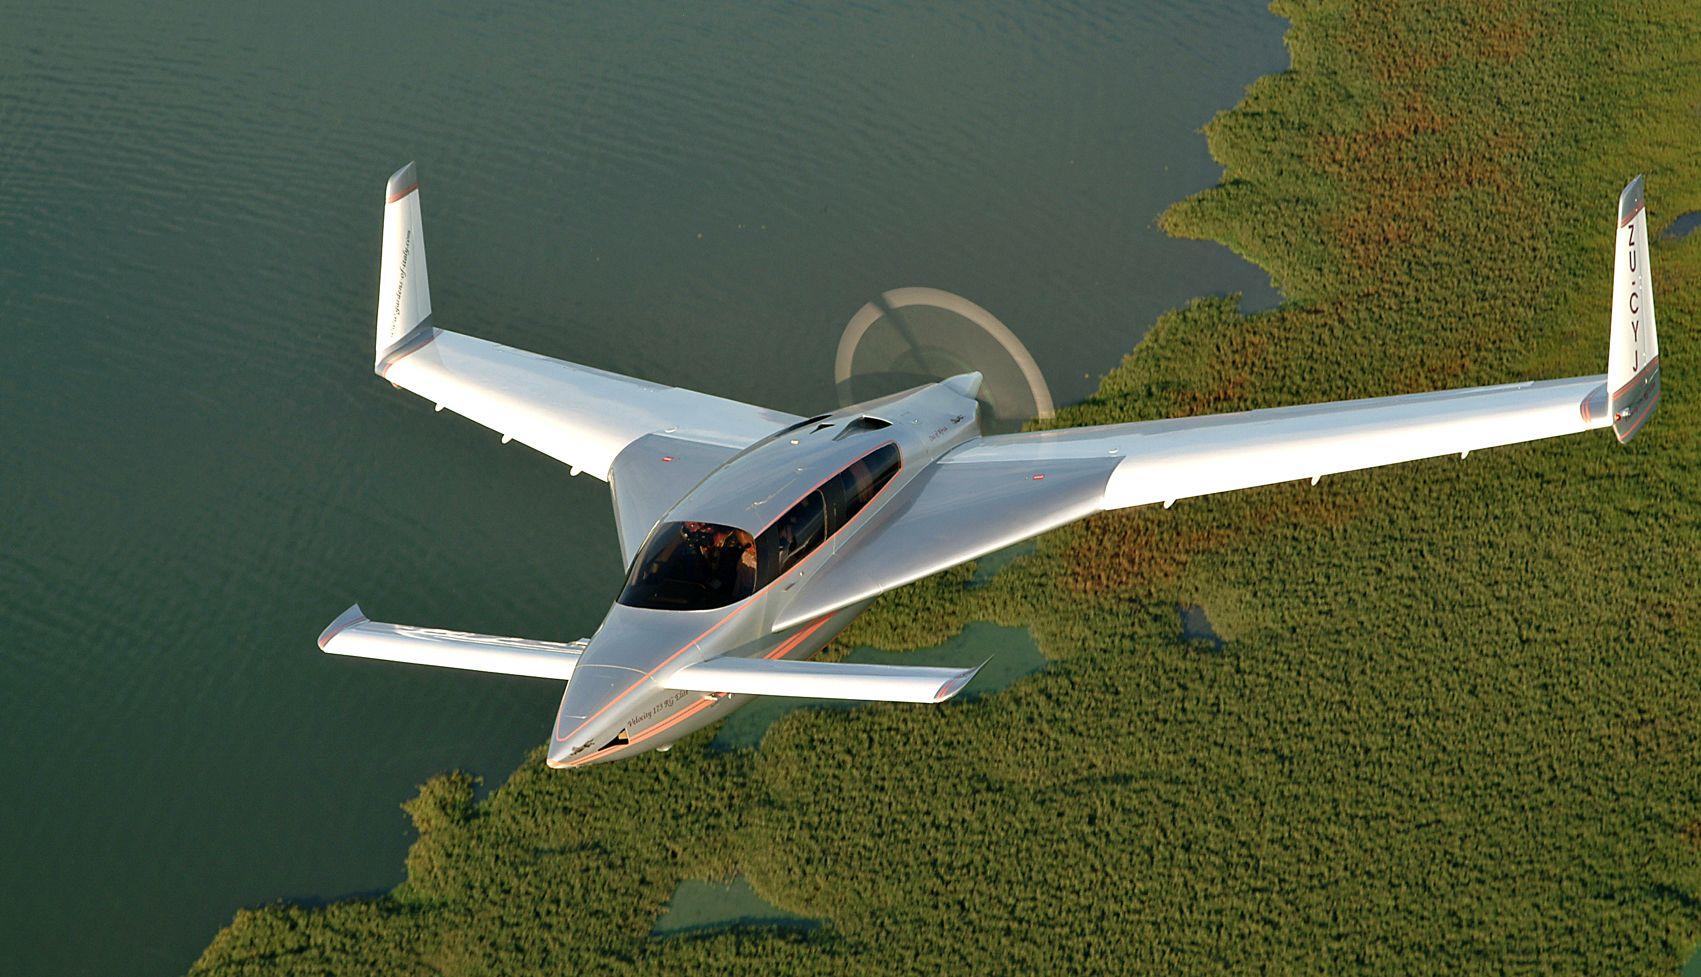 Velocity Aircraft Txl Experimental Airplane